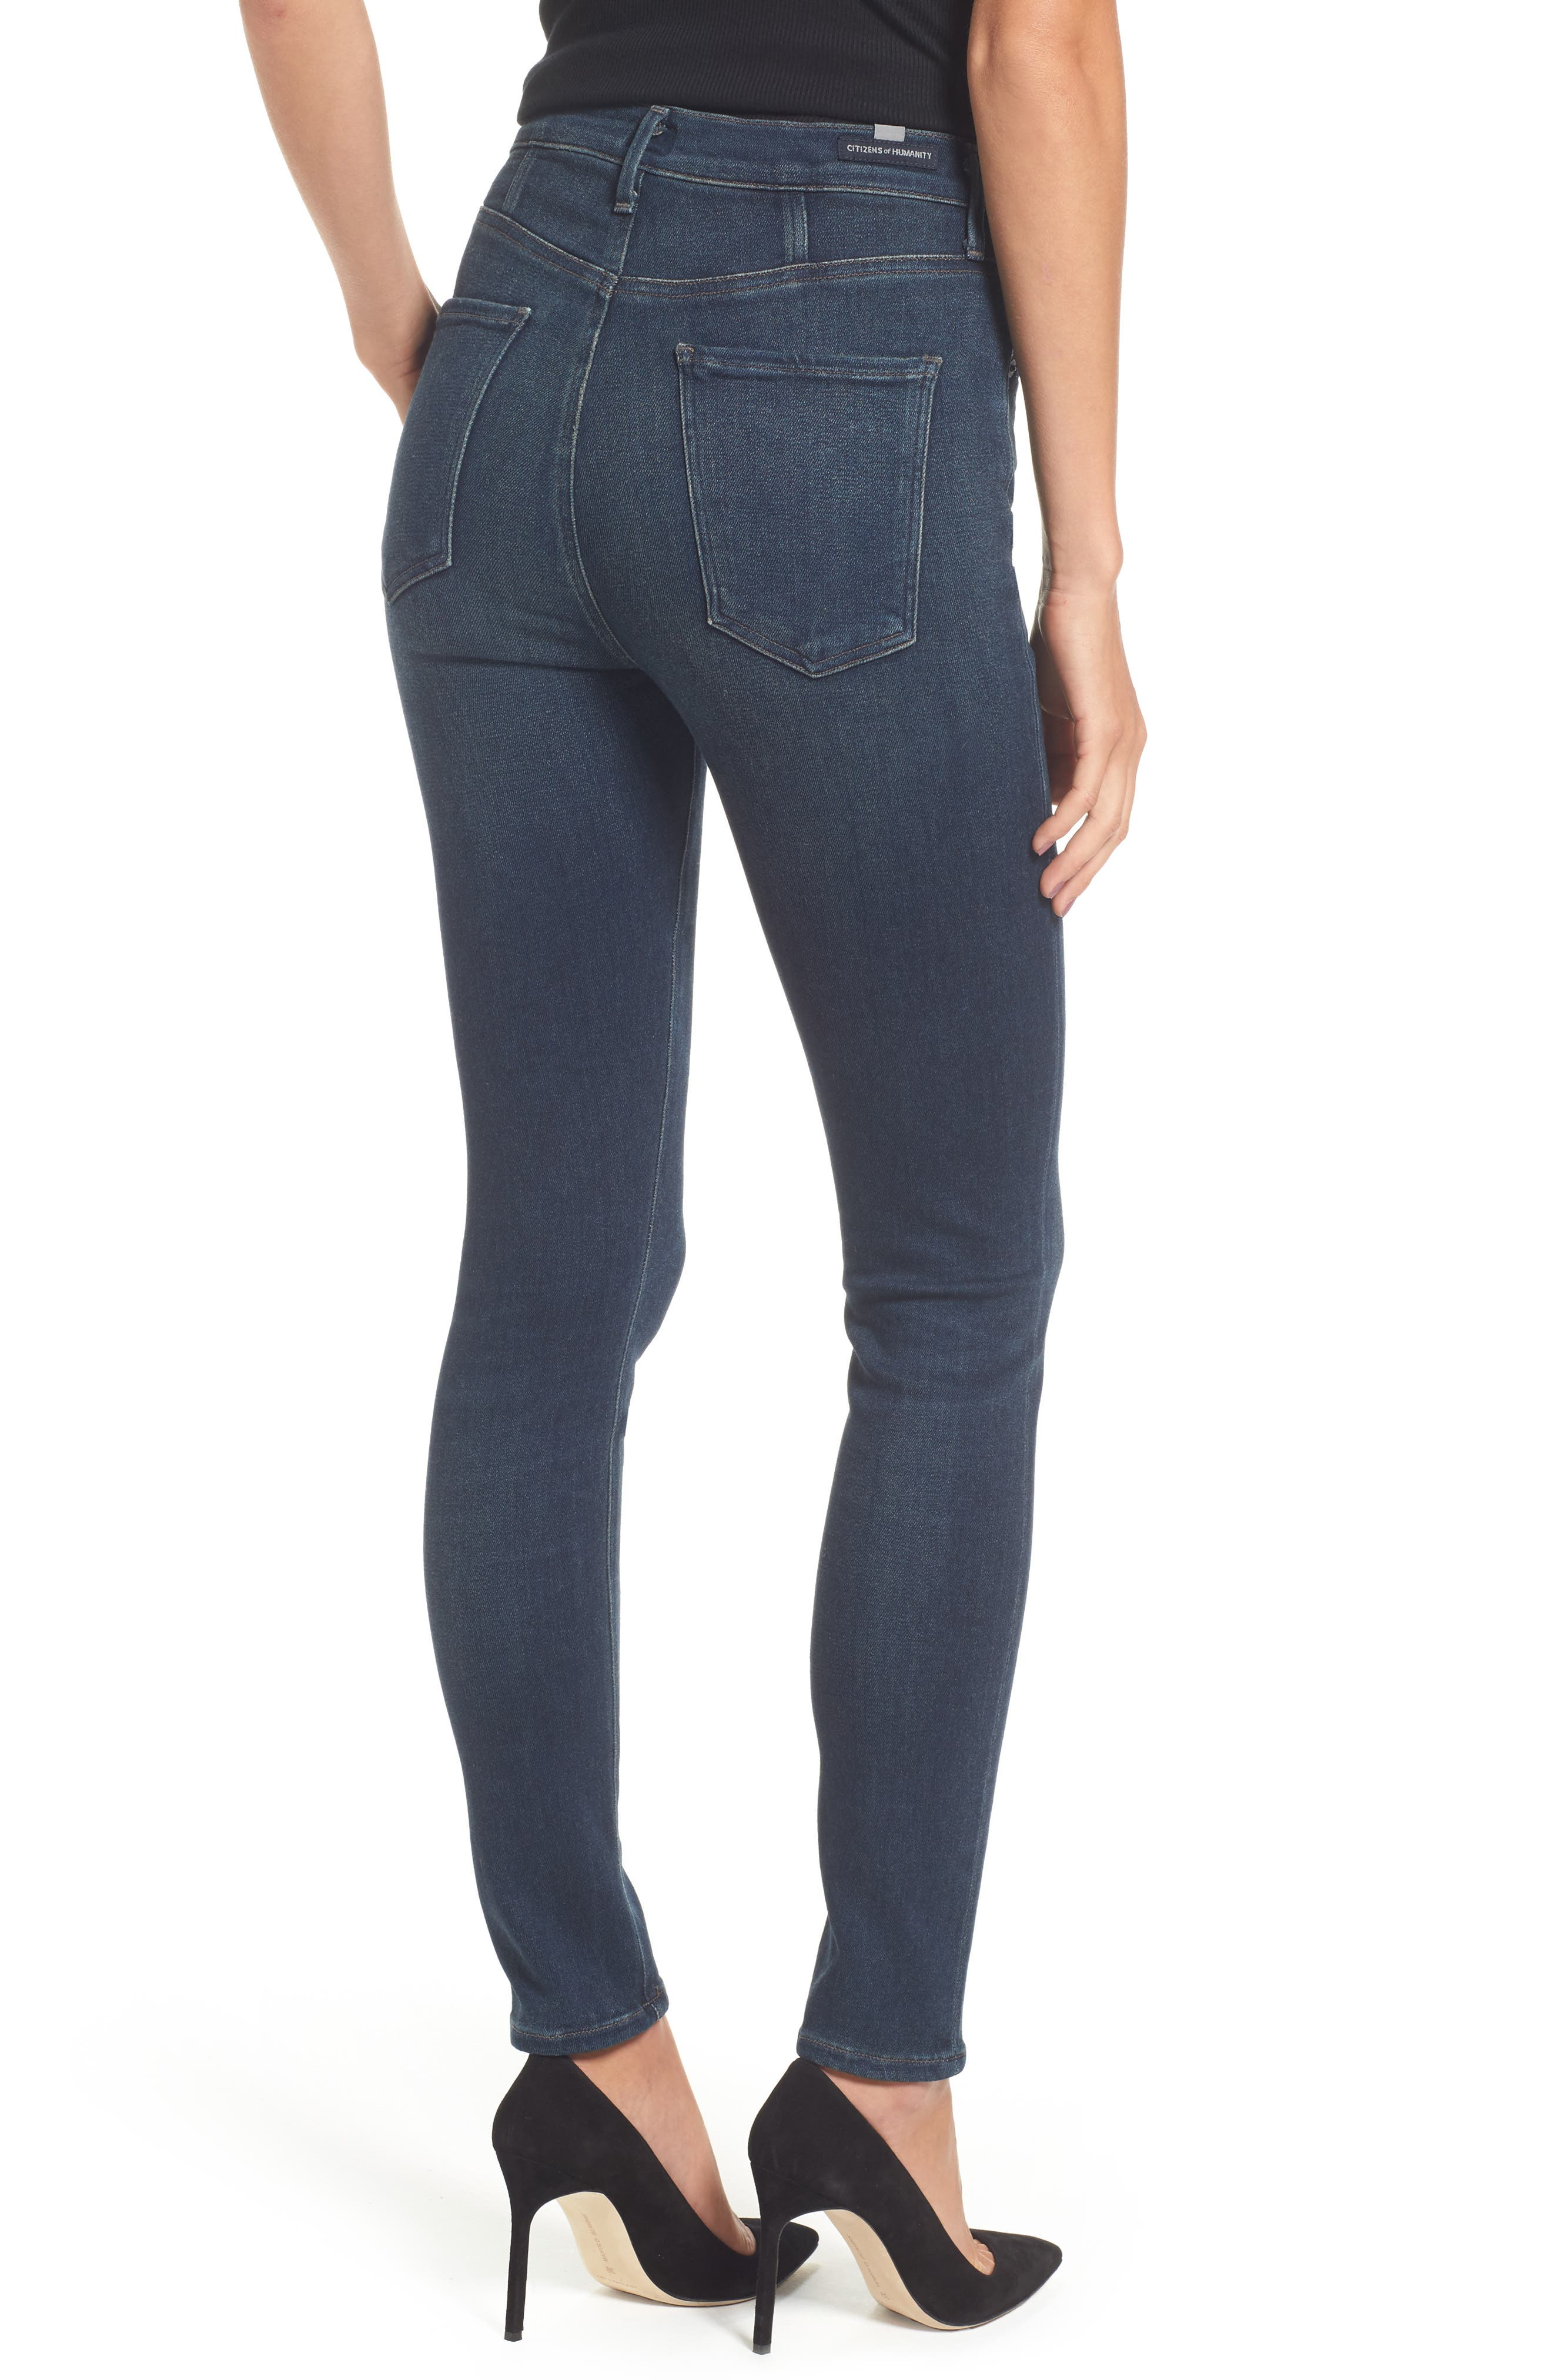 Alternate Image 2  - Citizens of Humanity Chrissy High Waist Skinny Jeans (Haze)